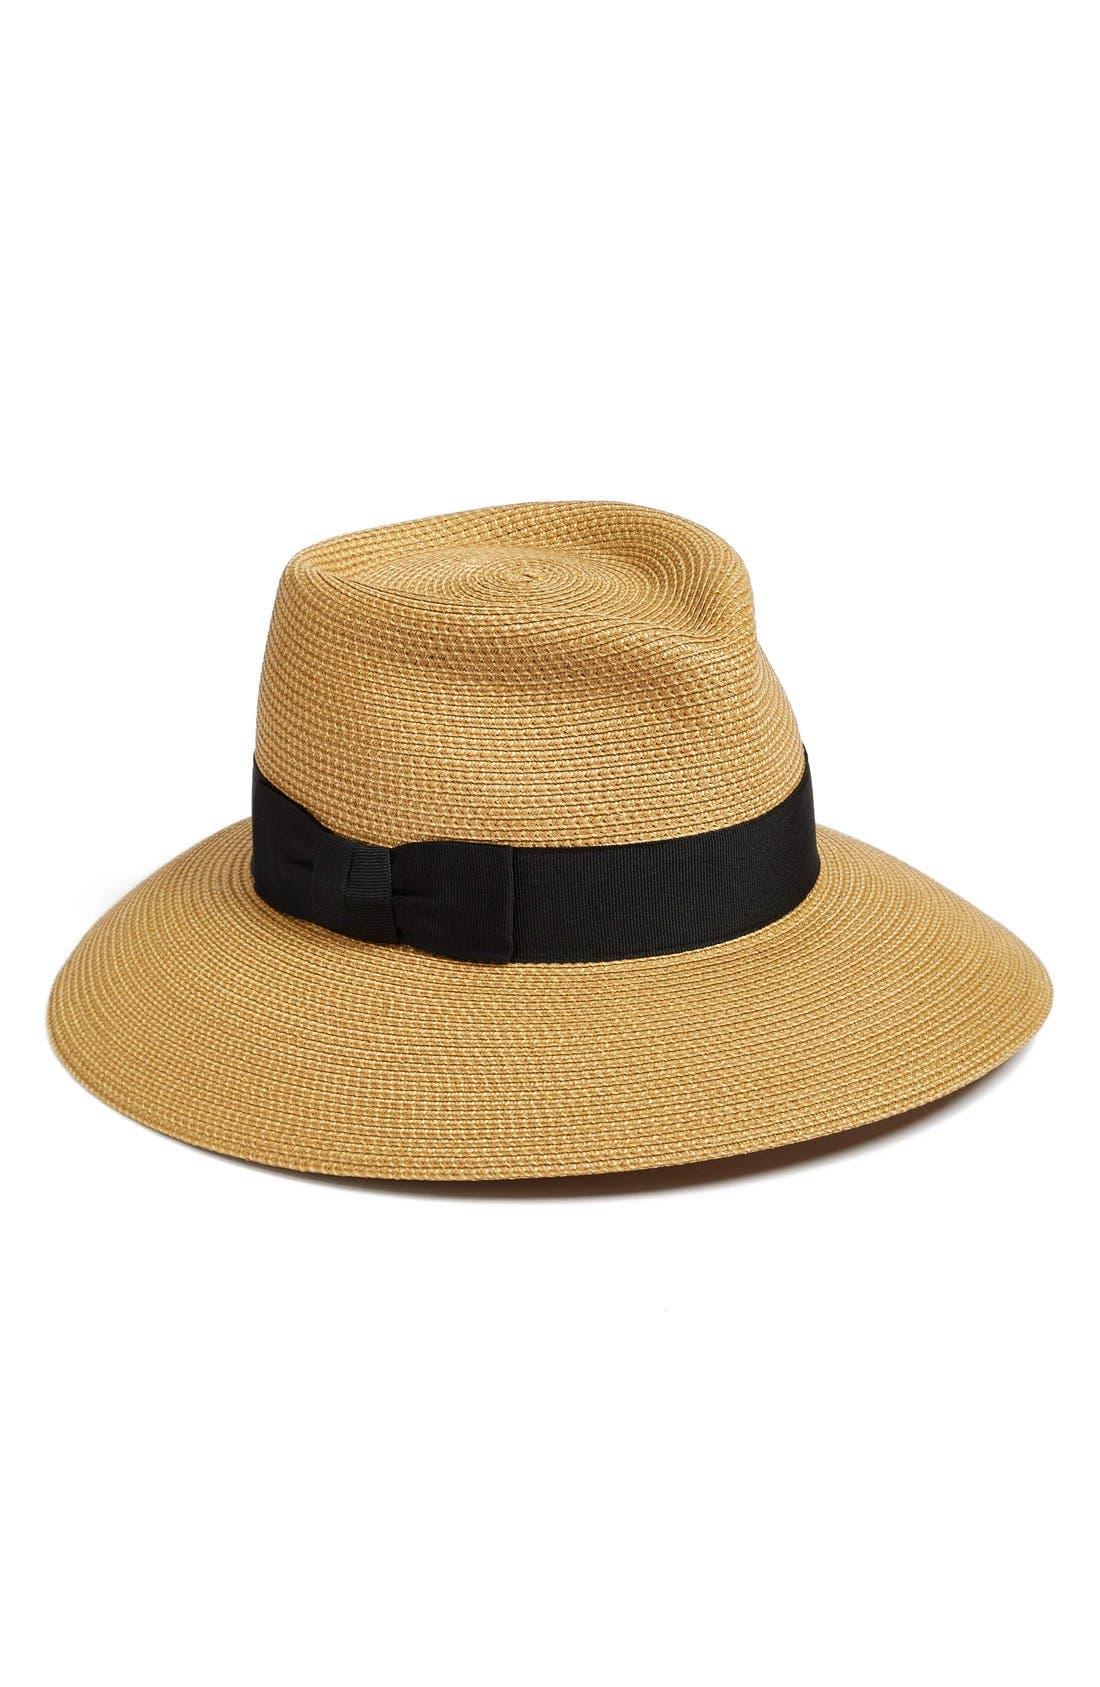 ERIC JAVITS Phoenix Packable Fedora Sun Hat